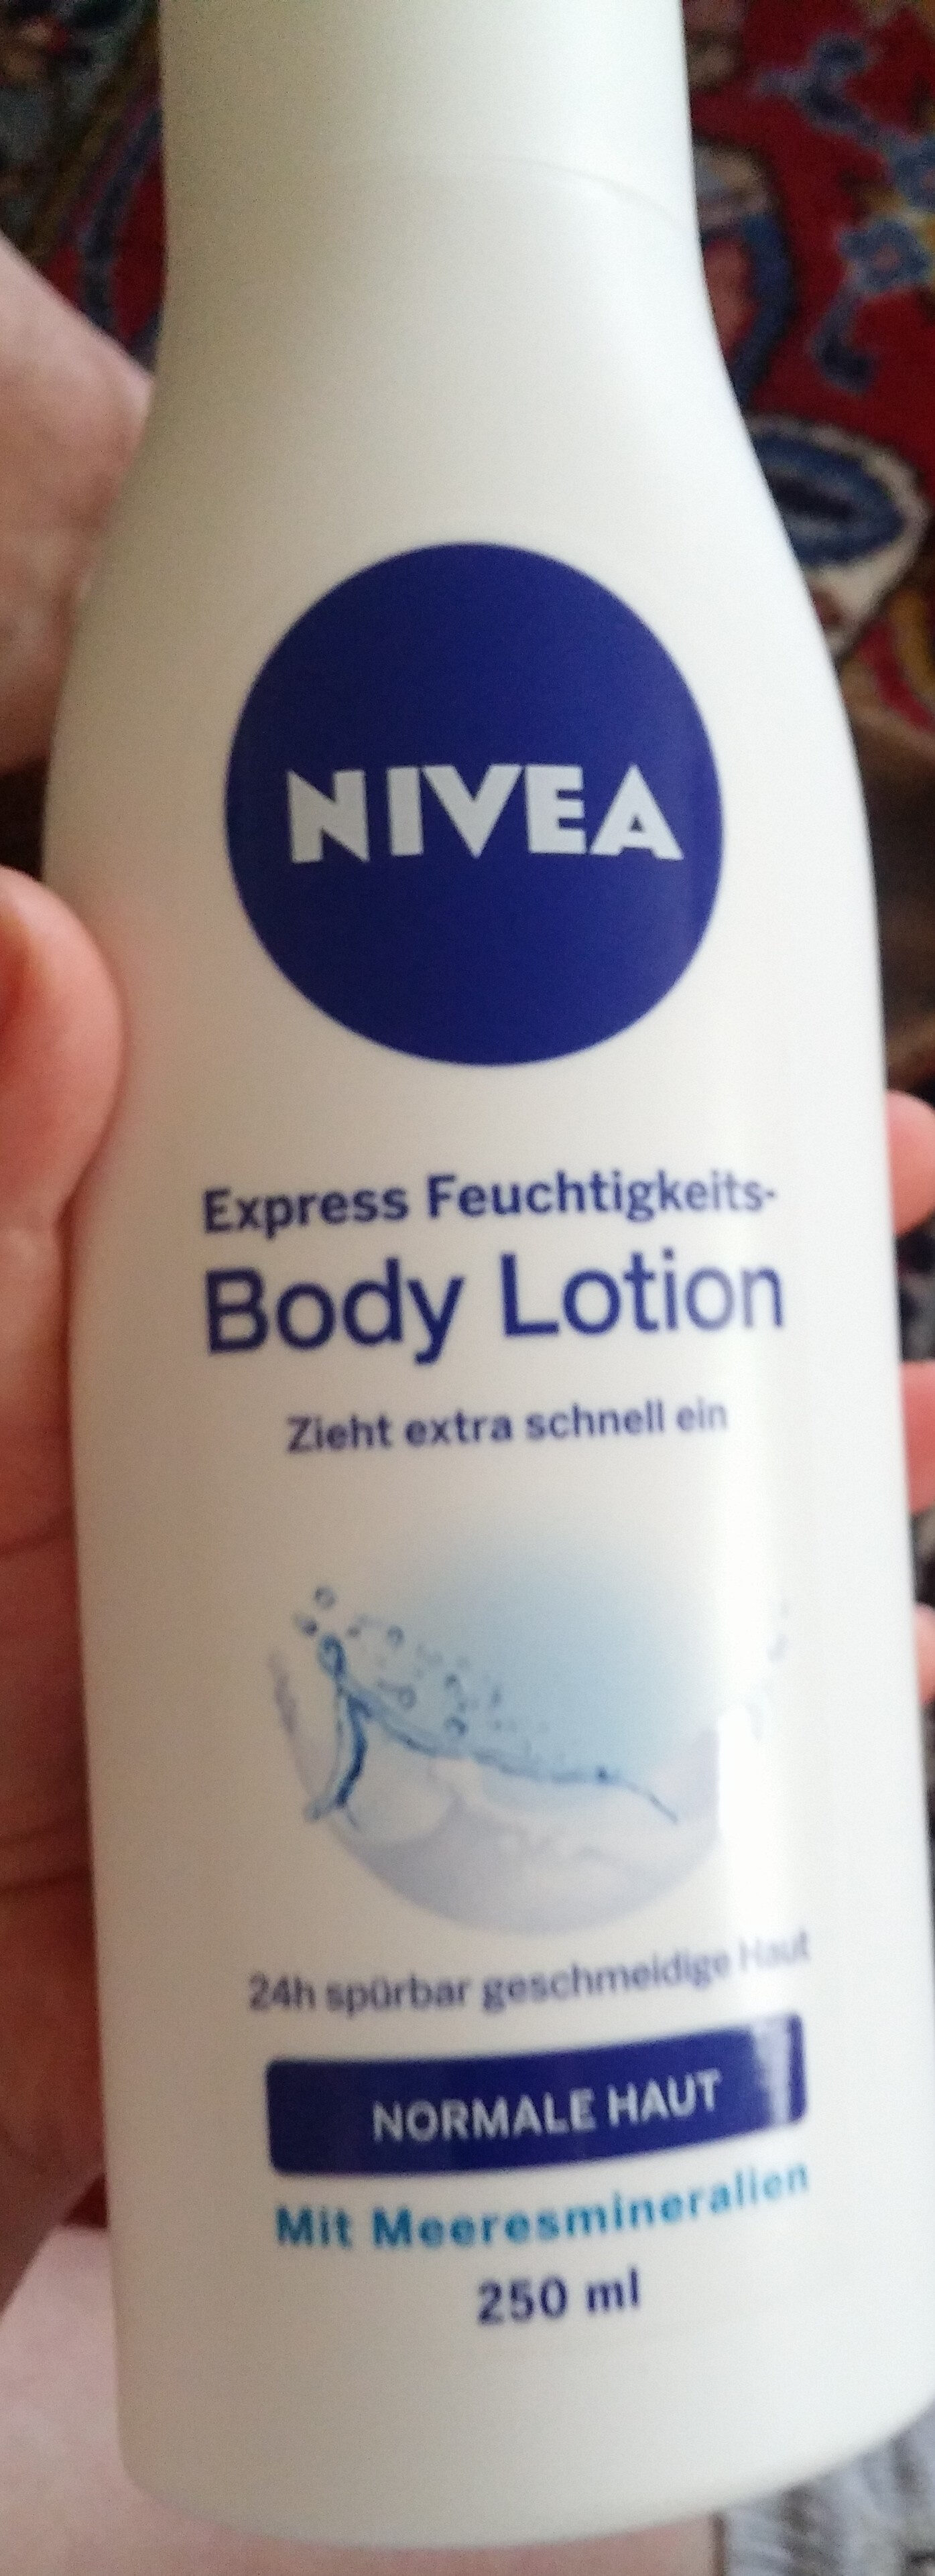 Bodi Lotion - Product